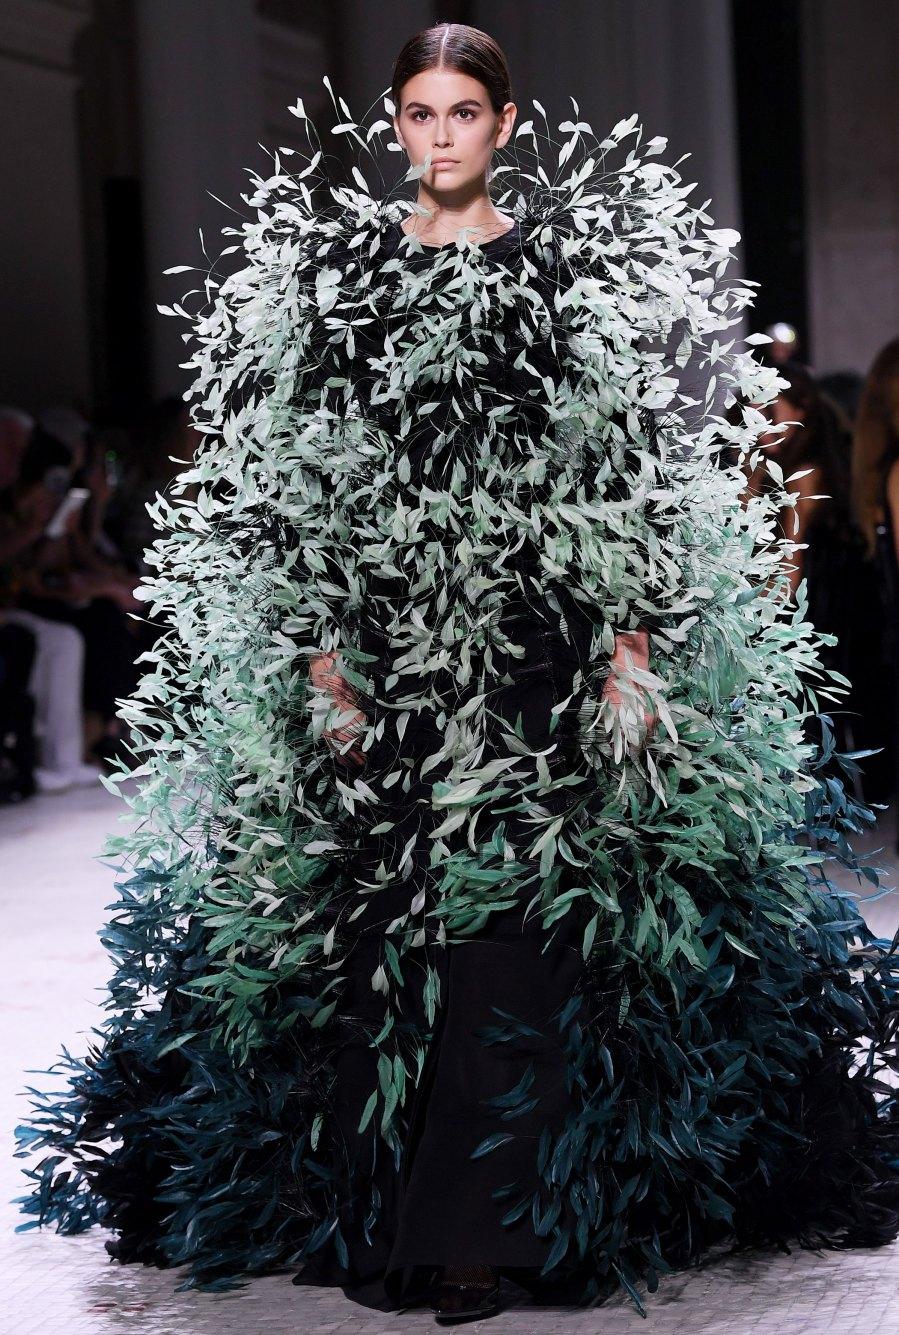 Kaia Gerber Runway Looks - Givenchy Fall-Winter 2019